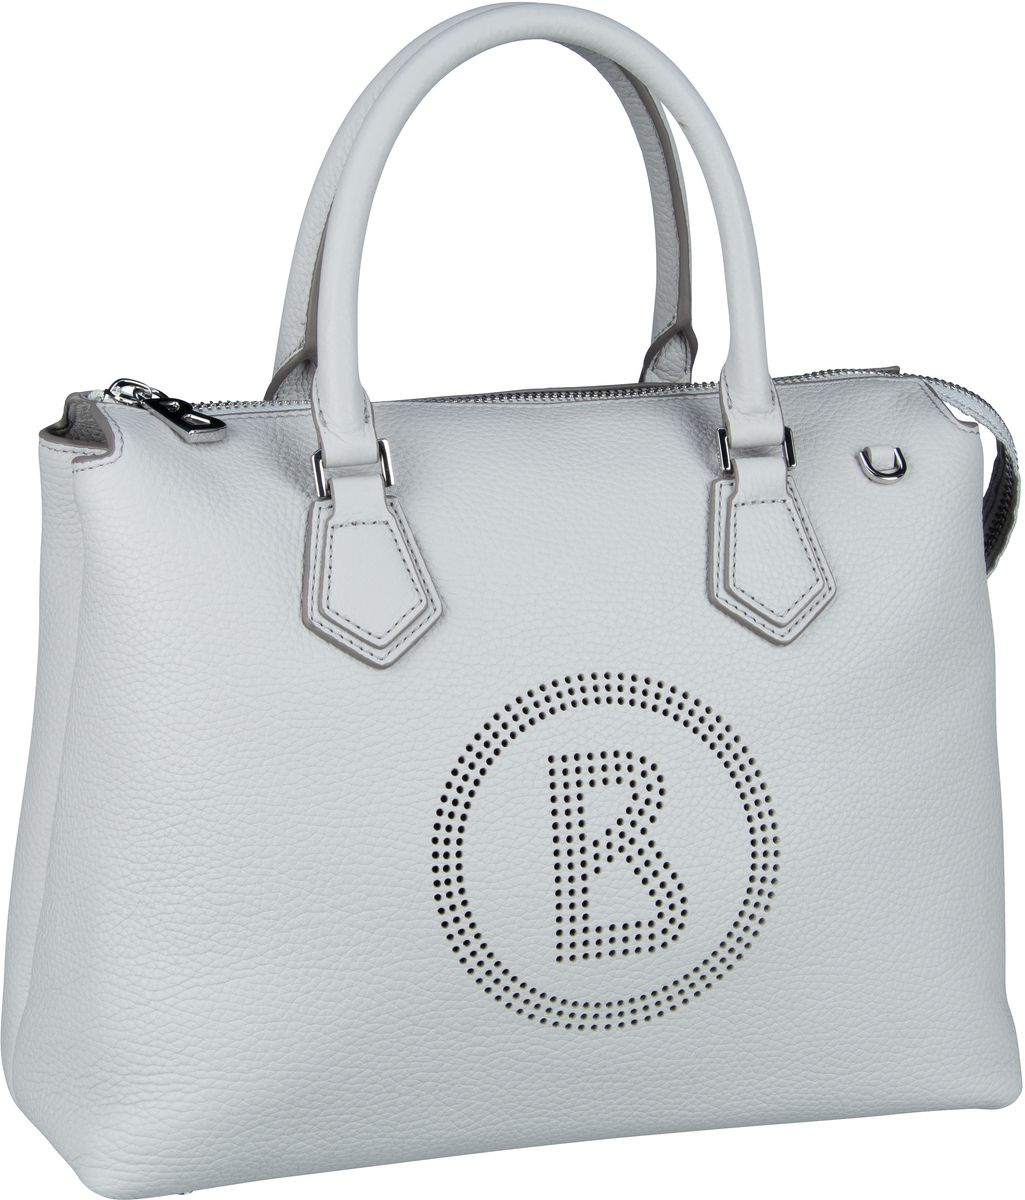 Handtasche Sulden Frida Handbag MHZ Light Grey